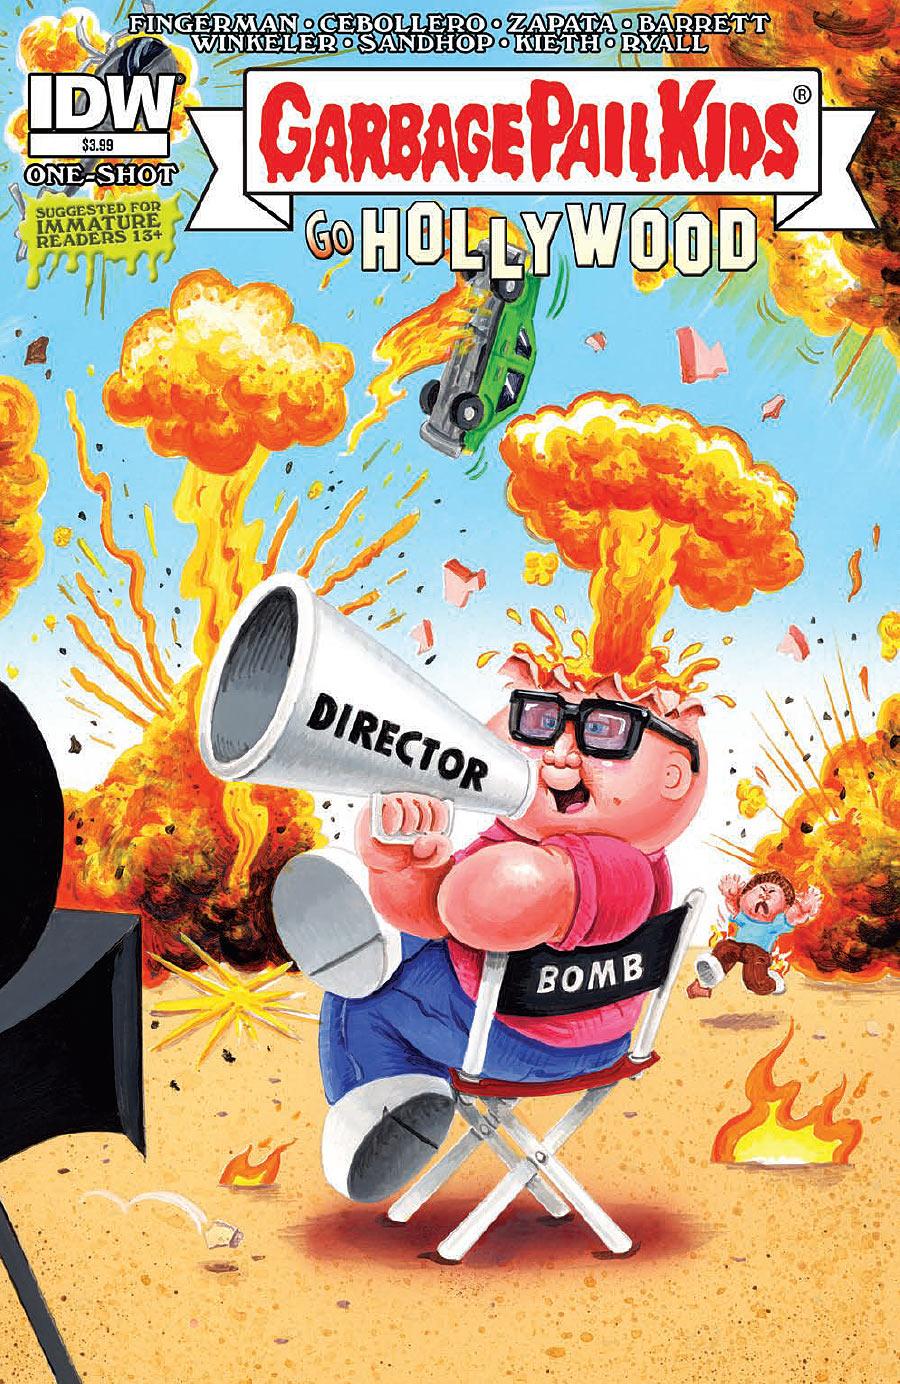 Garbage Pail Kids Go Hollywood #1